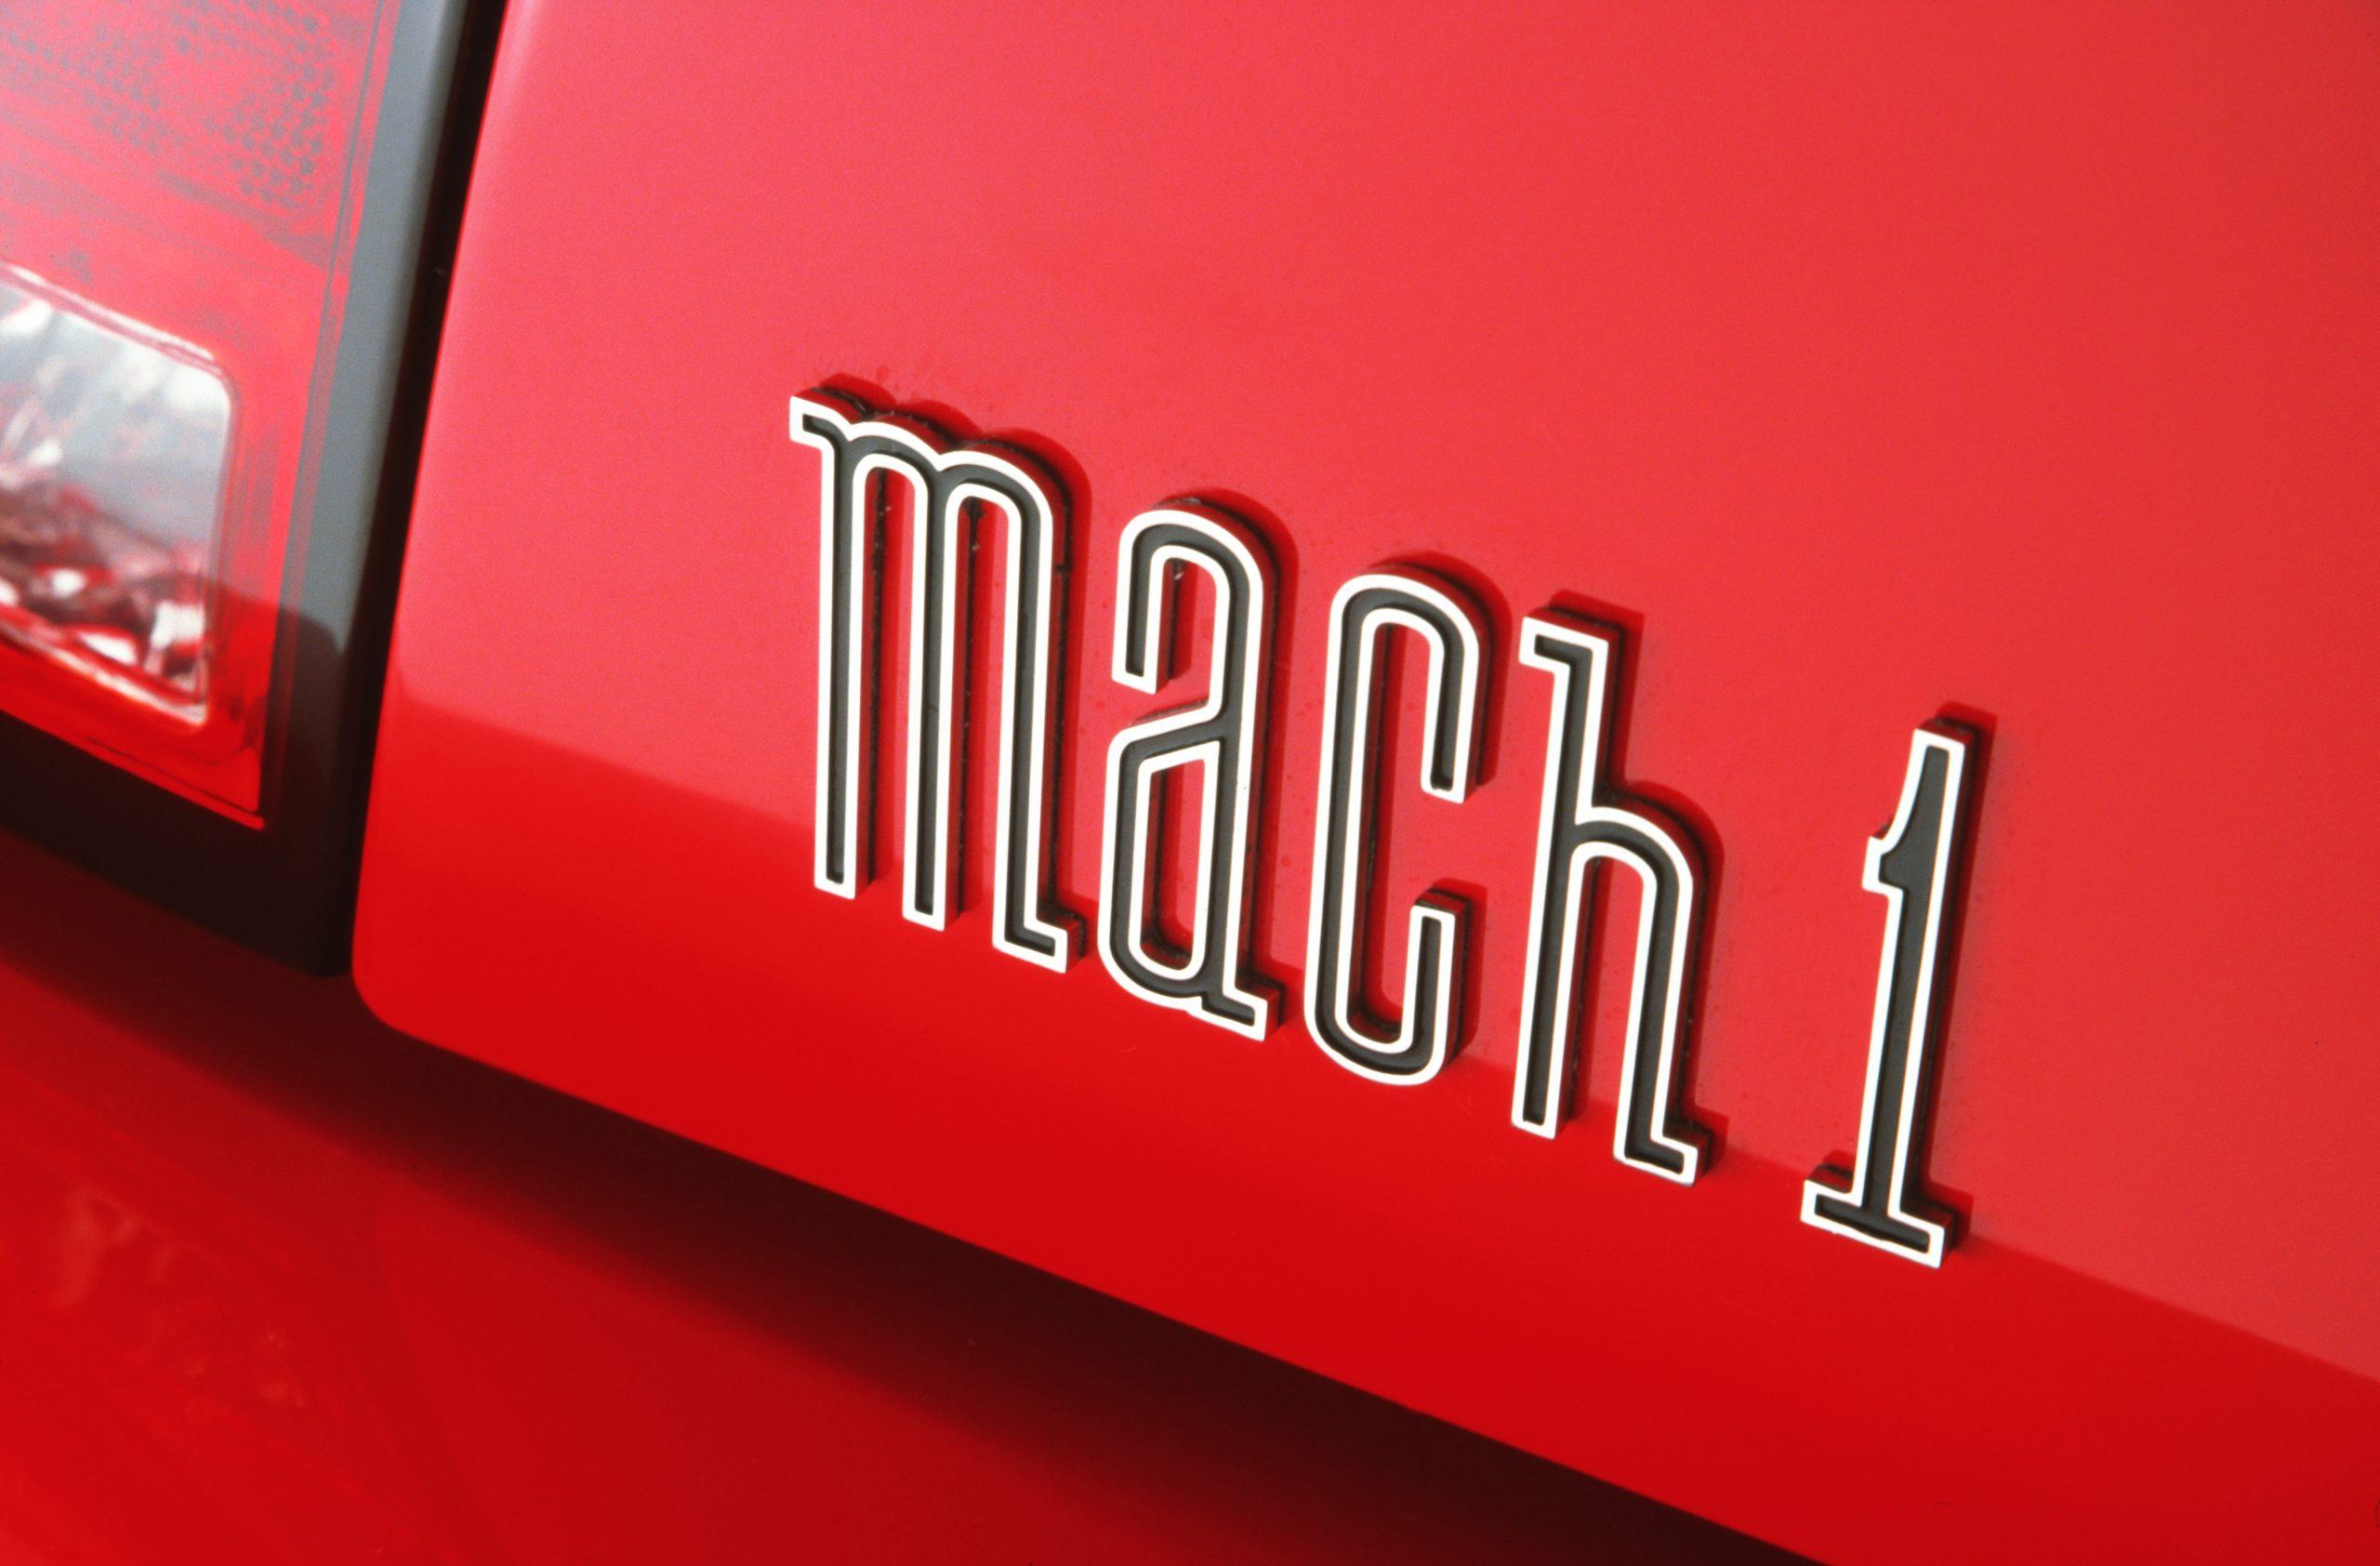 2003 Ford Mustang Mach 1 decklid emblem